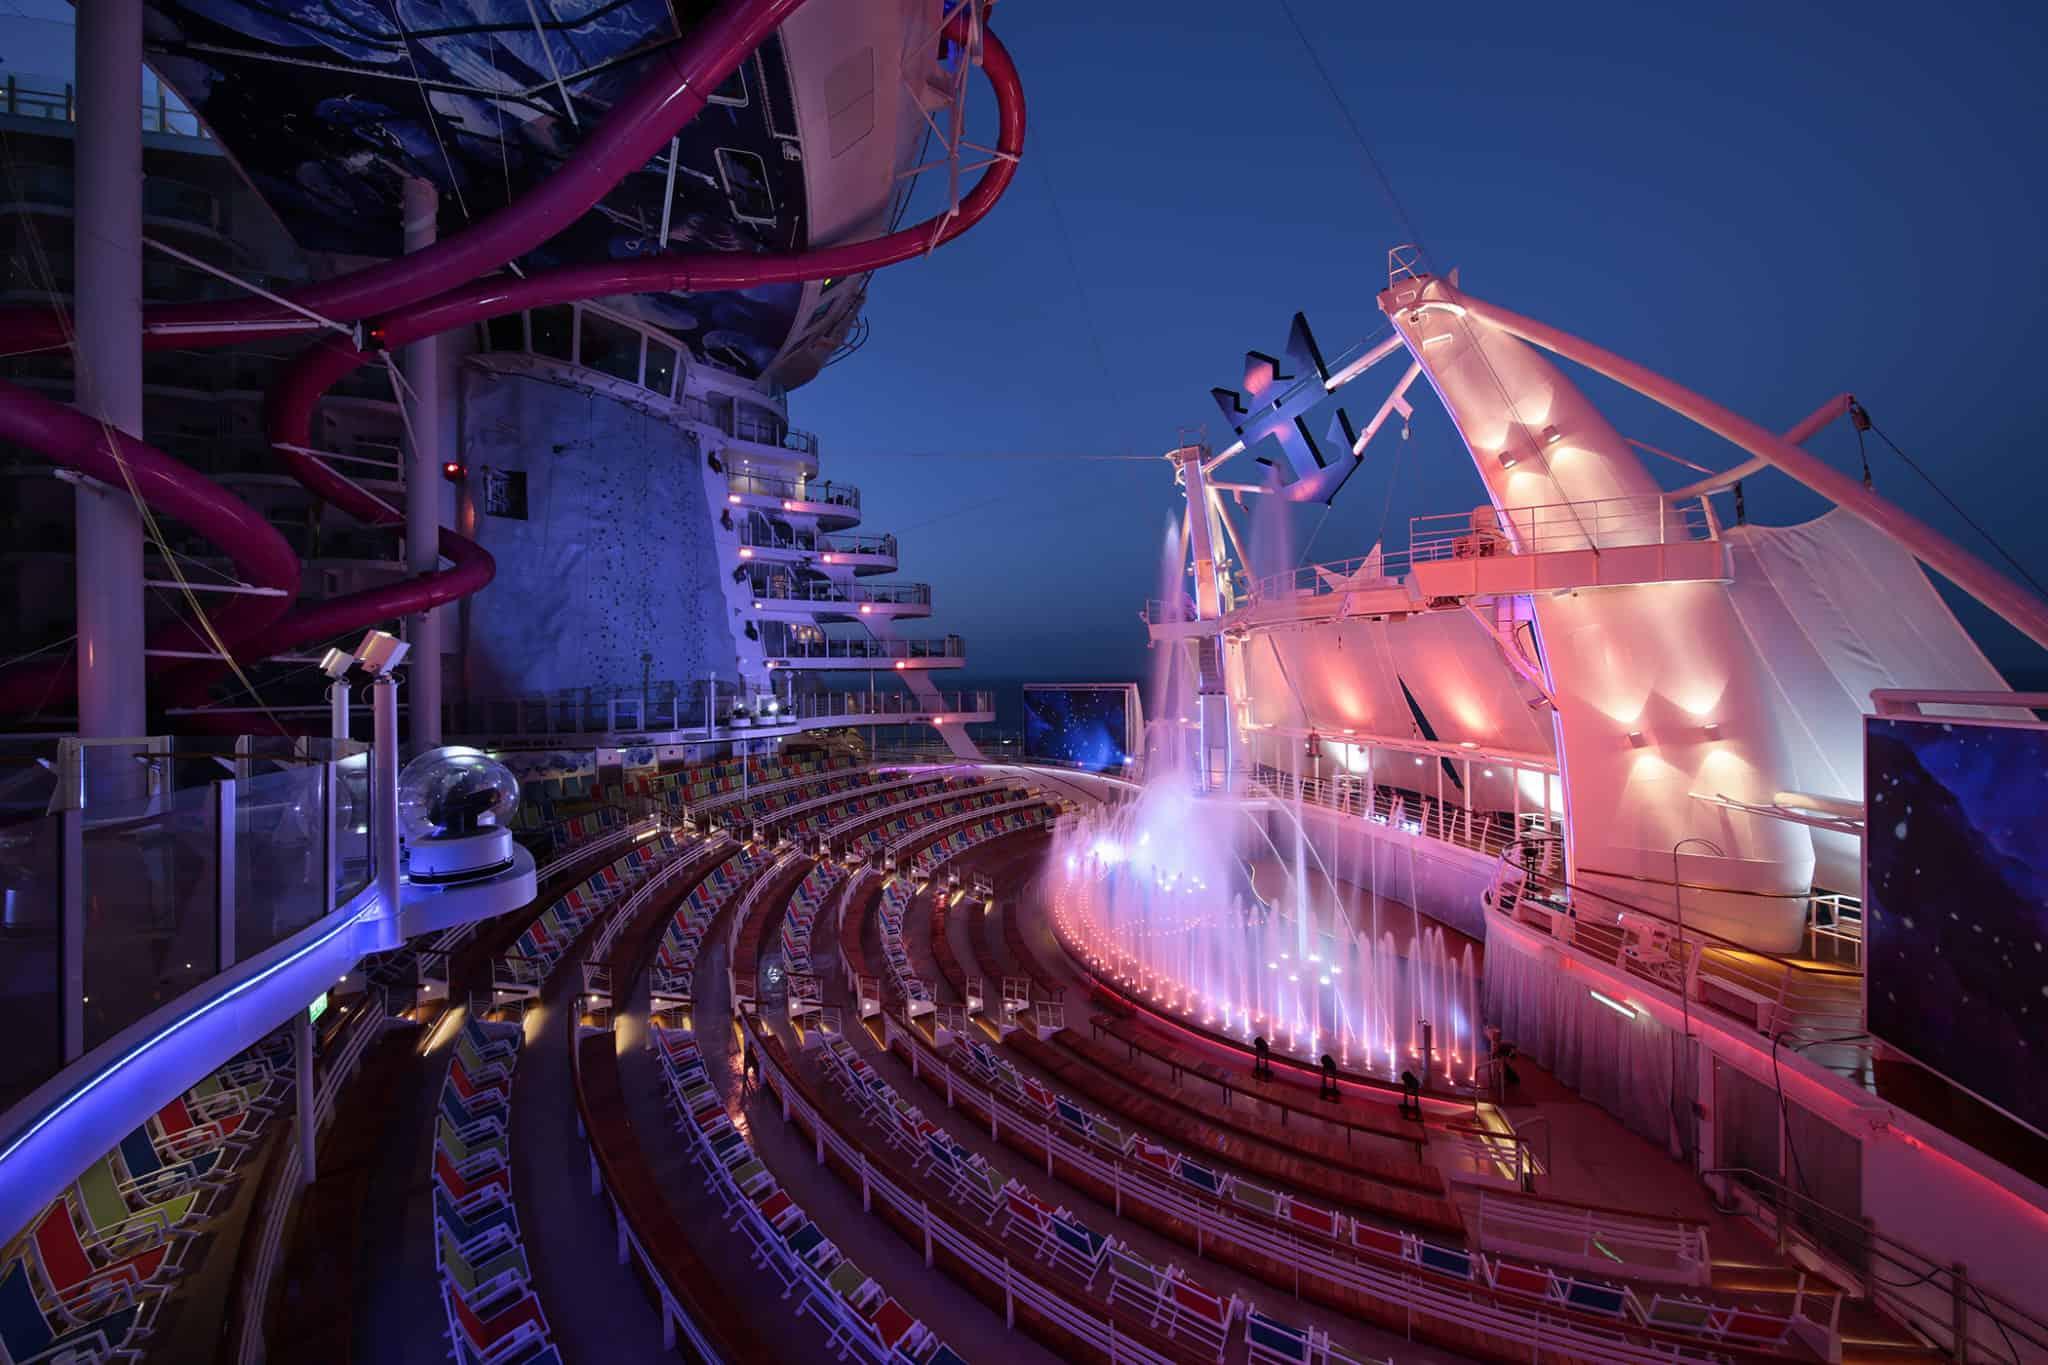 AquaTheater - Deck 6 Aft Harmony of the Seas - Royal Caribbean International